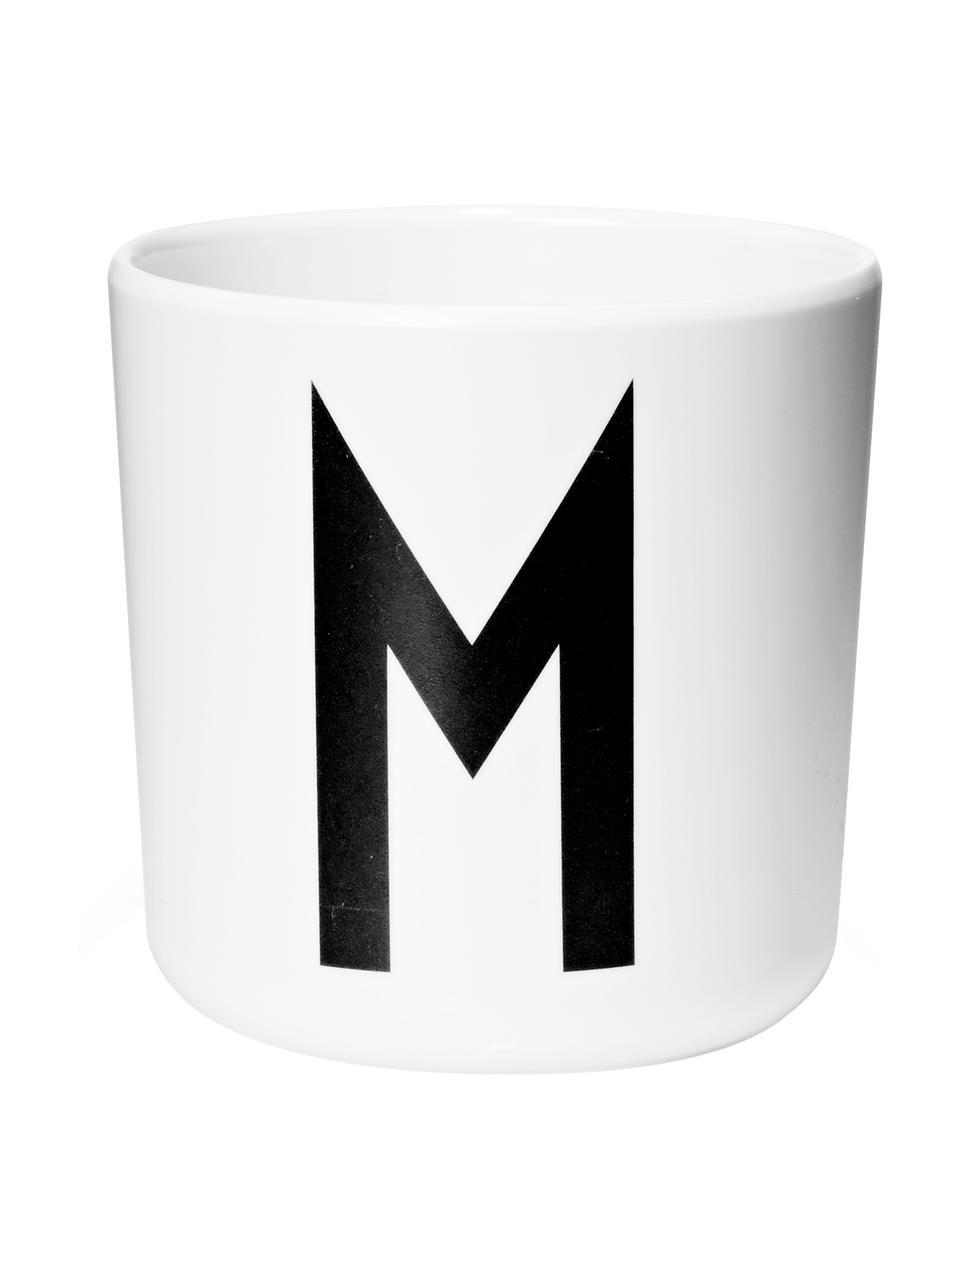 Kinderbeker Alphabet (varianten van A tot Z), Melamine, Wit, zwart, Beker M